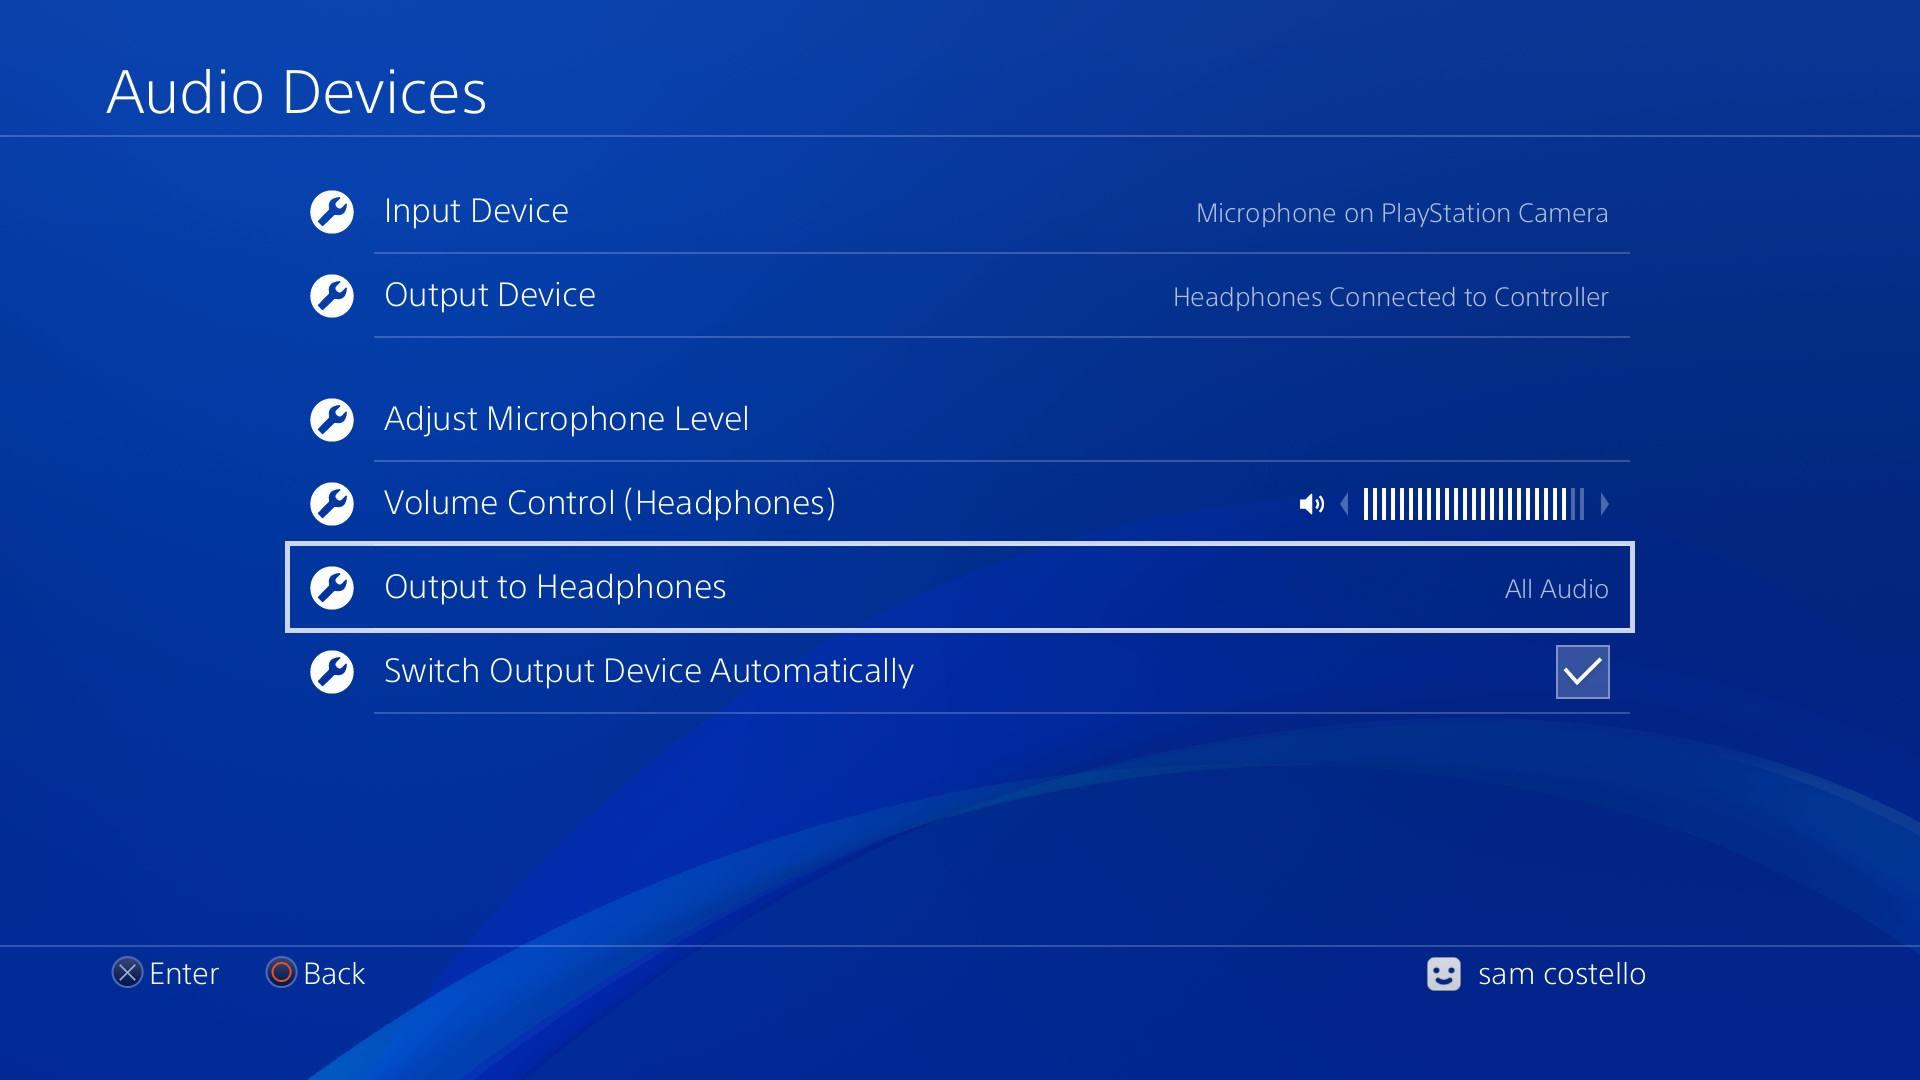 Screenshot of PS4 audio devices menu